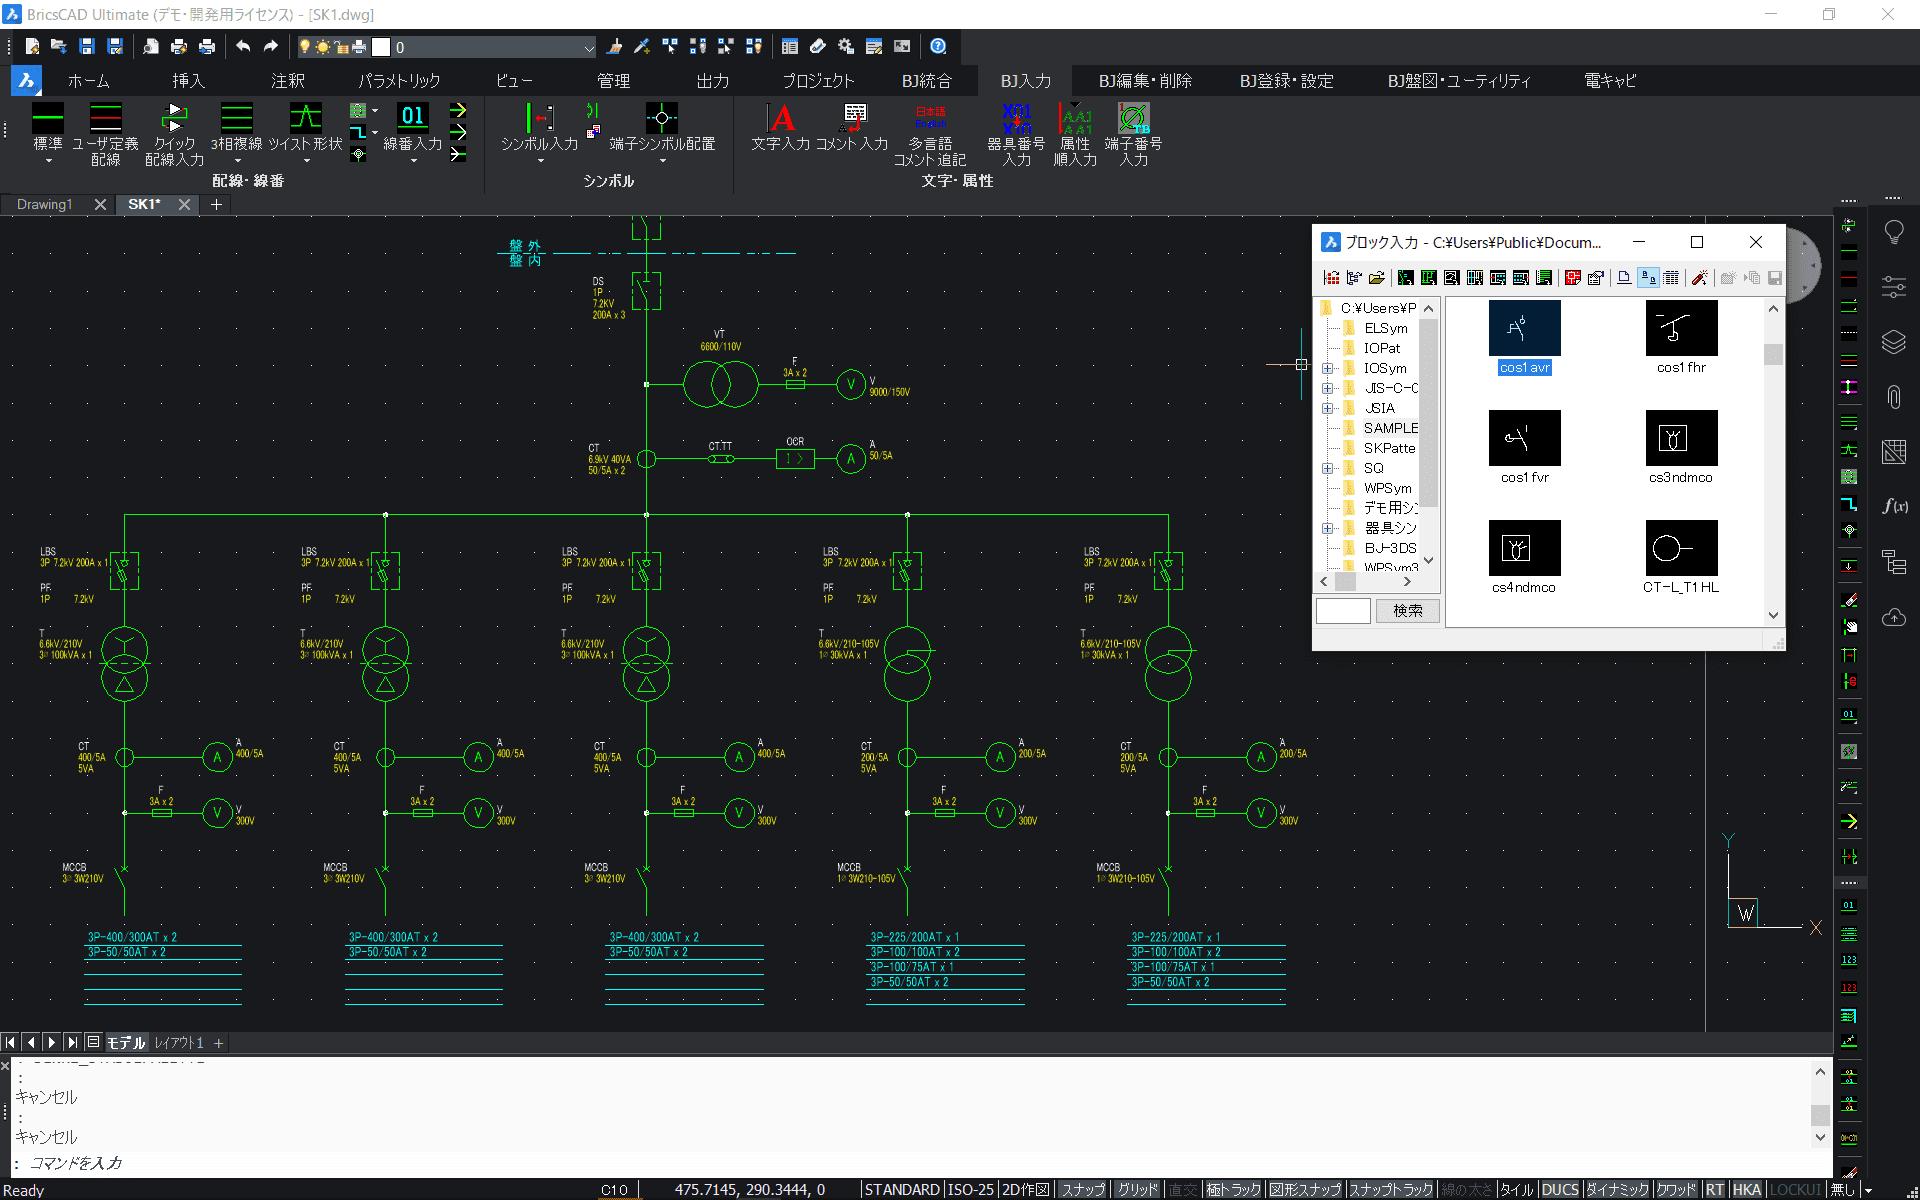 BJ-Electrical